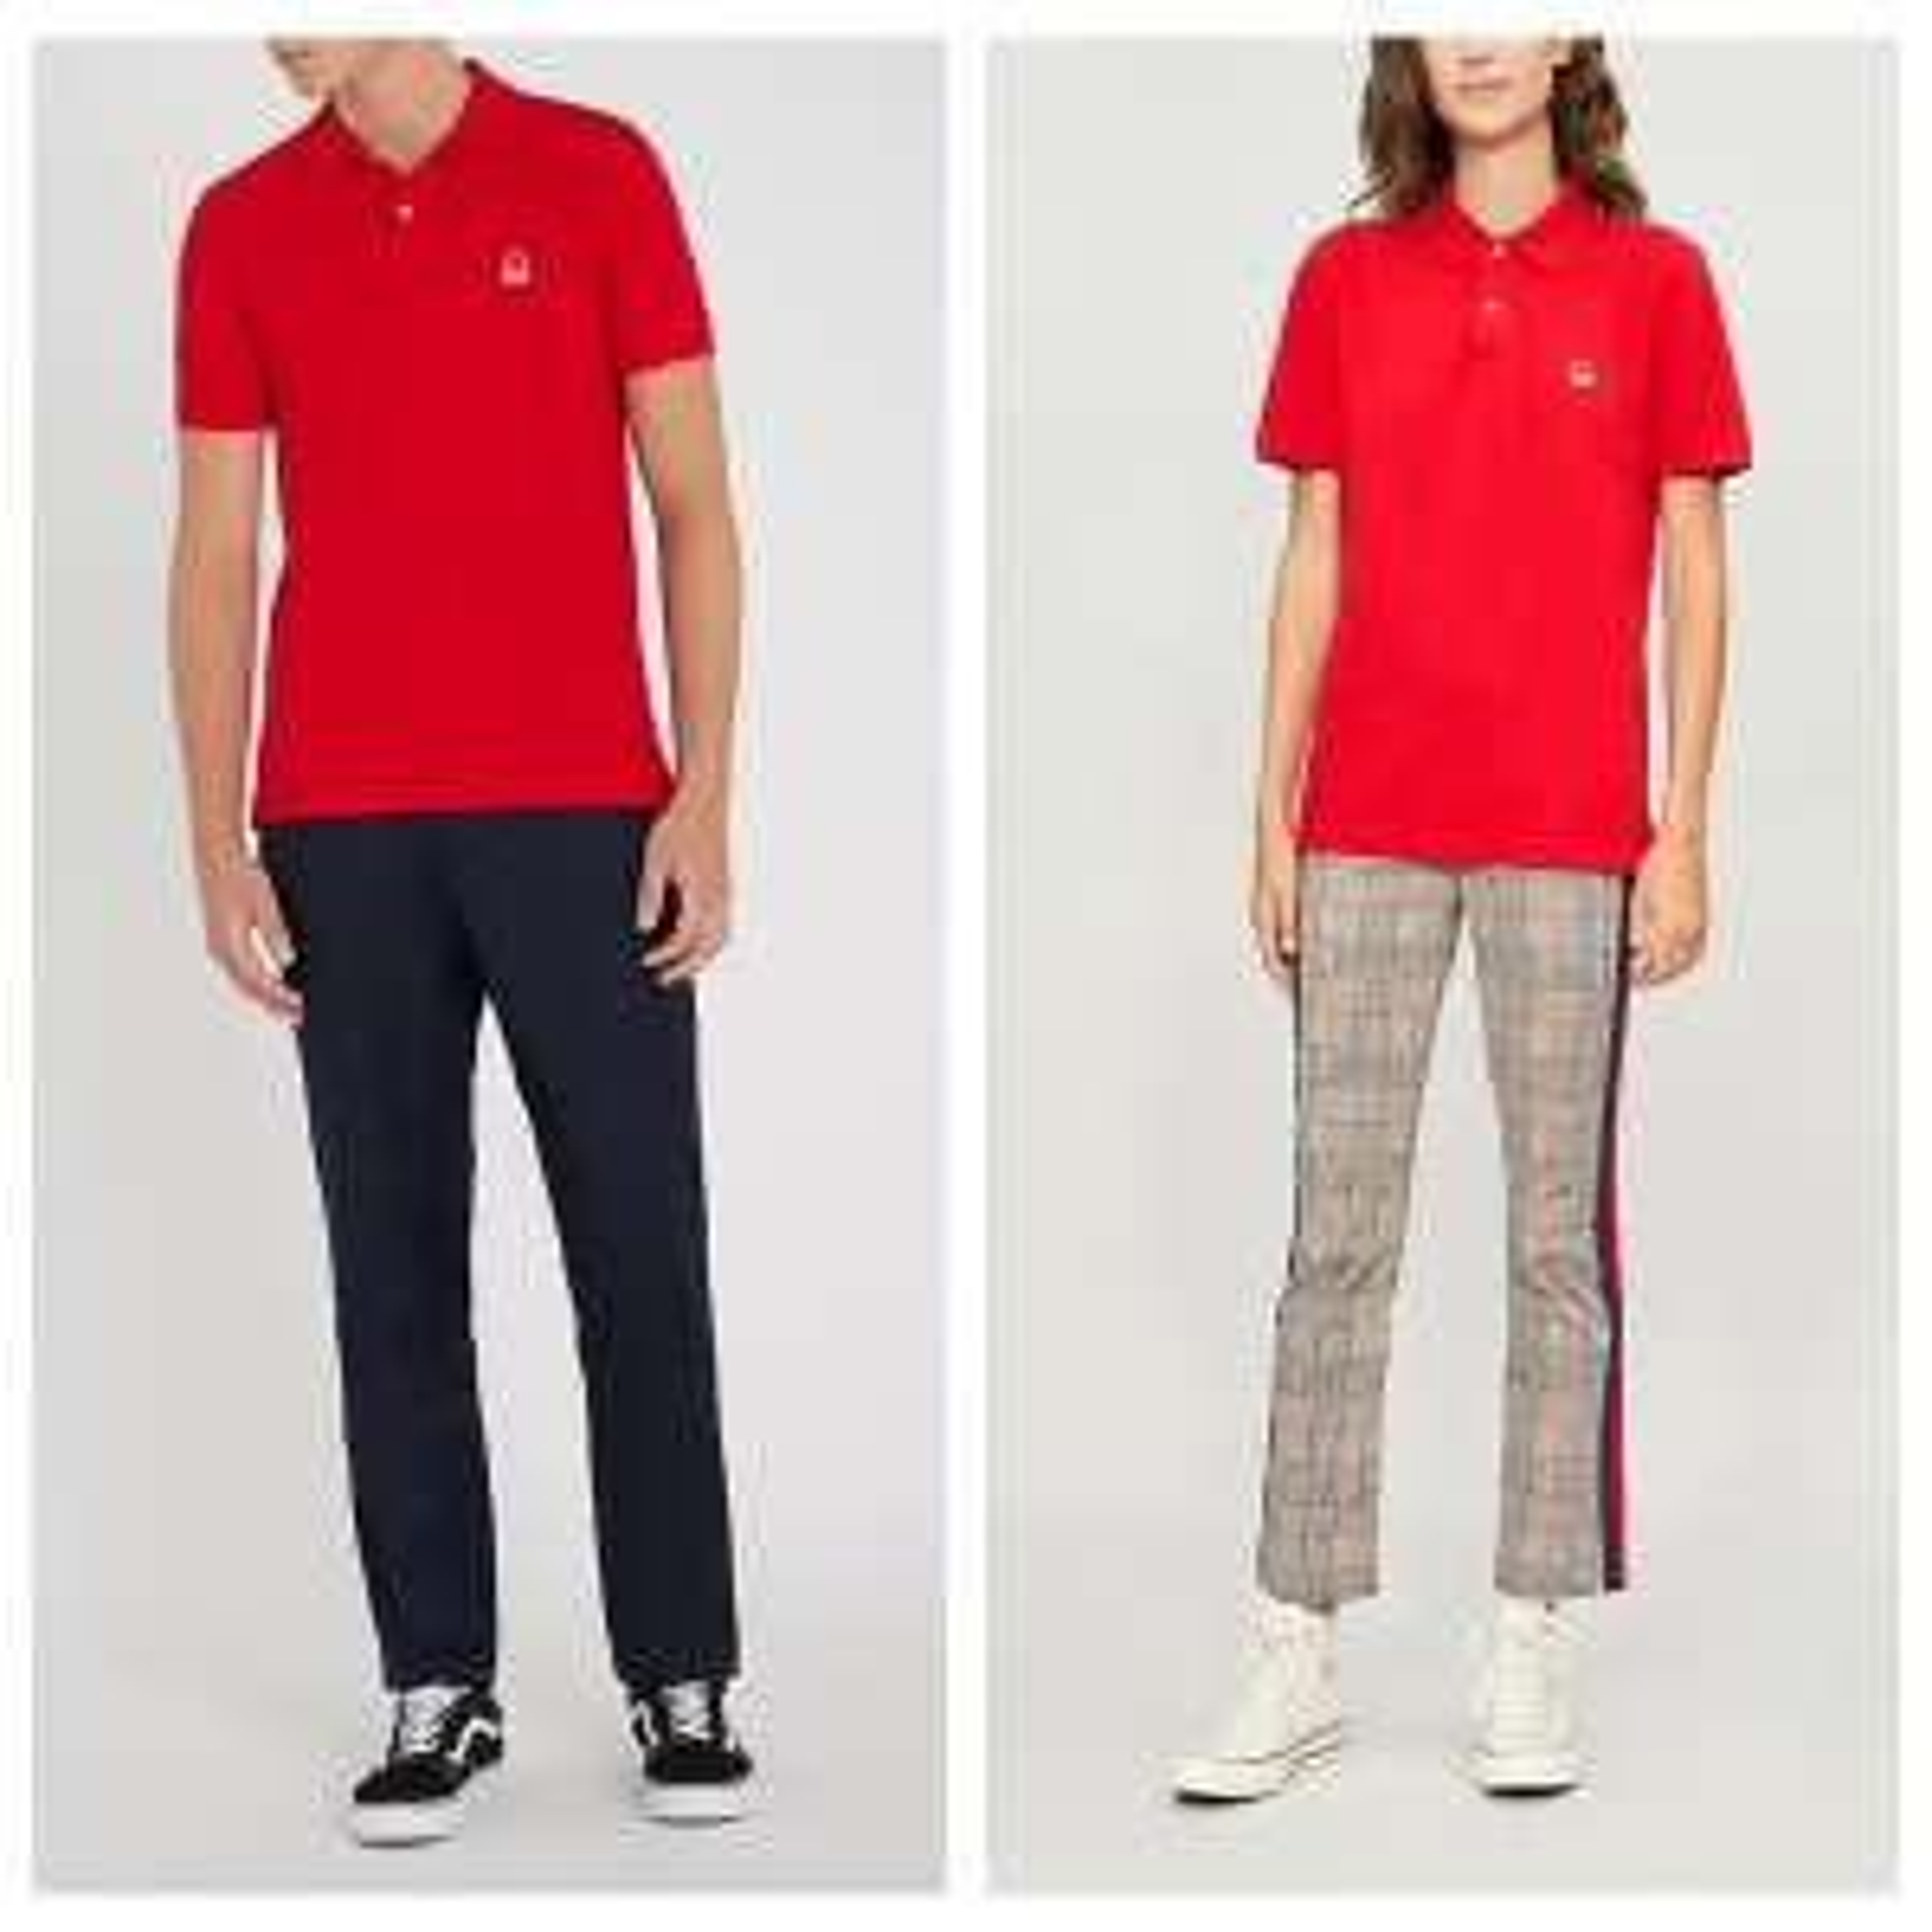 BENETTON Unisex Logo-Embroidered Cotton-Piqué Polo Shirt. In Multiple Colours. EXCLUSIVE TO SELFRIDGES - £15 (Free C&C)